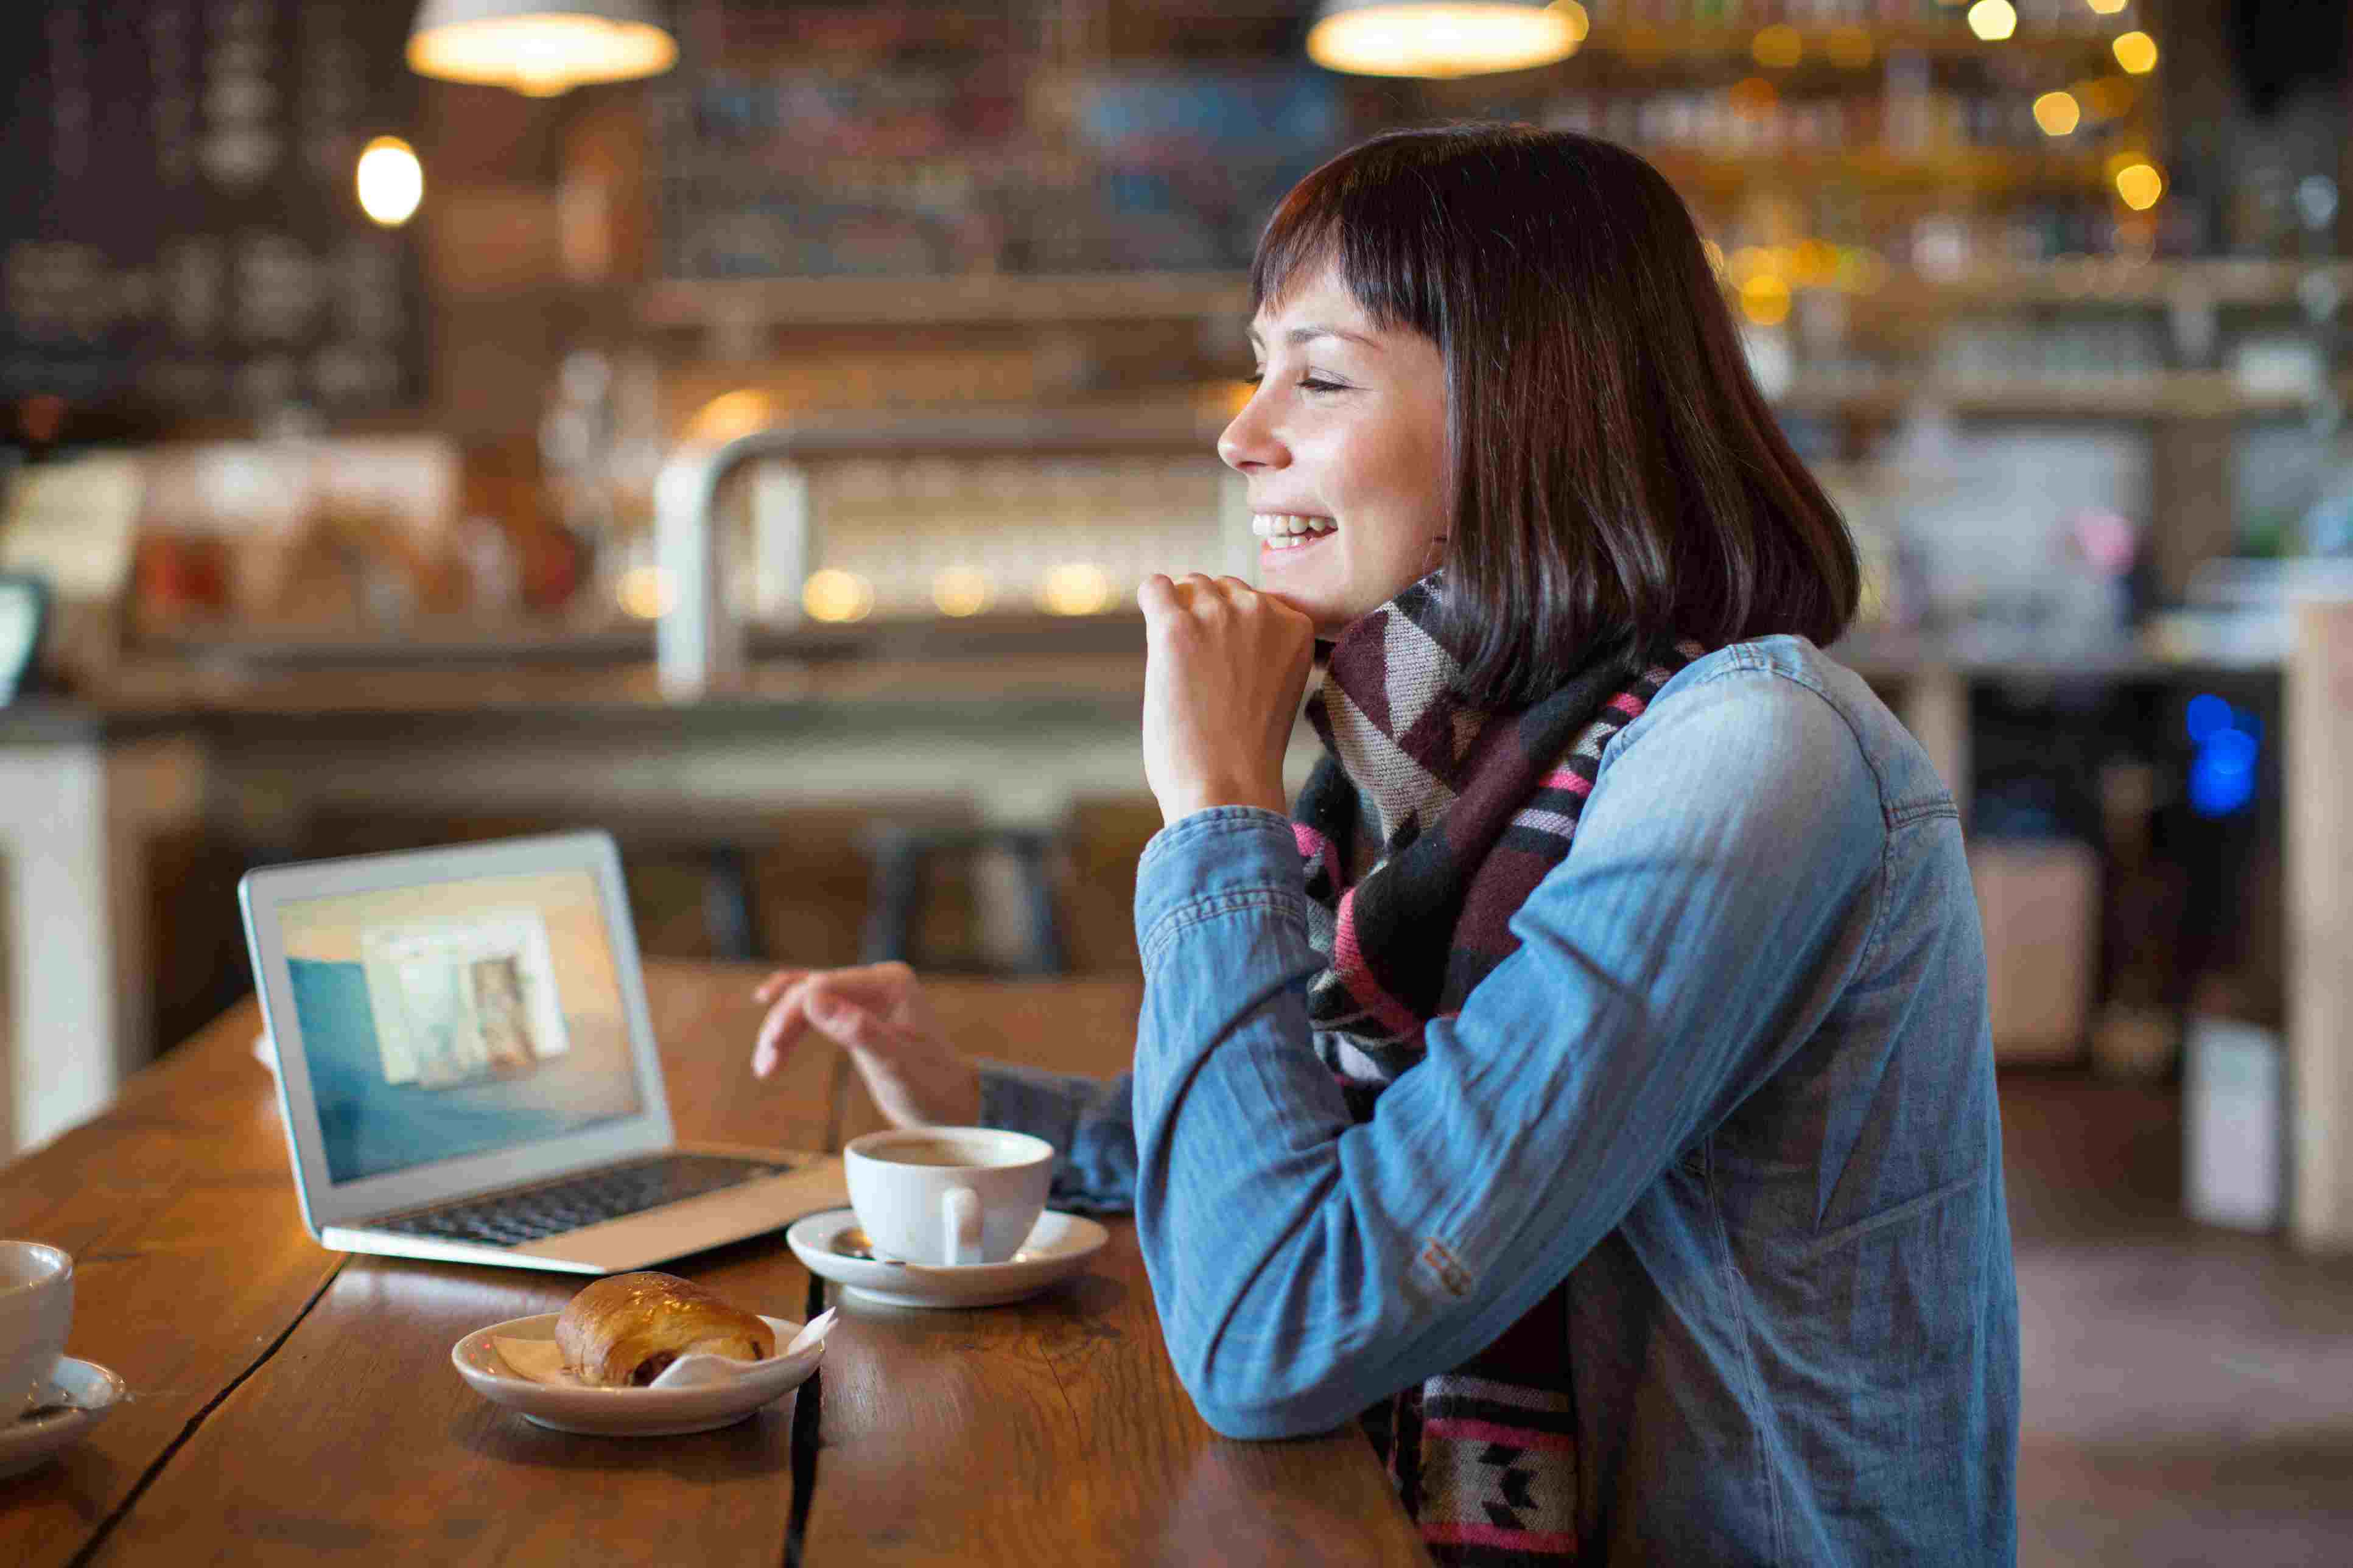 Smiling woman using laptop at coffee shop